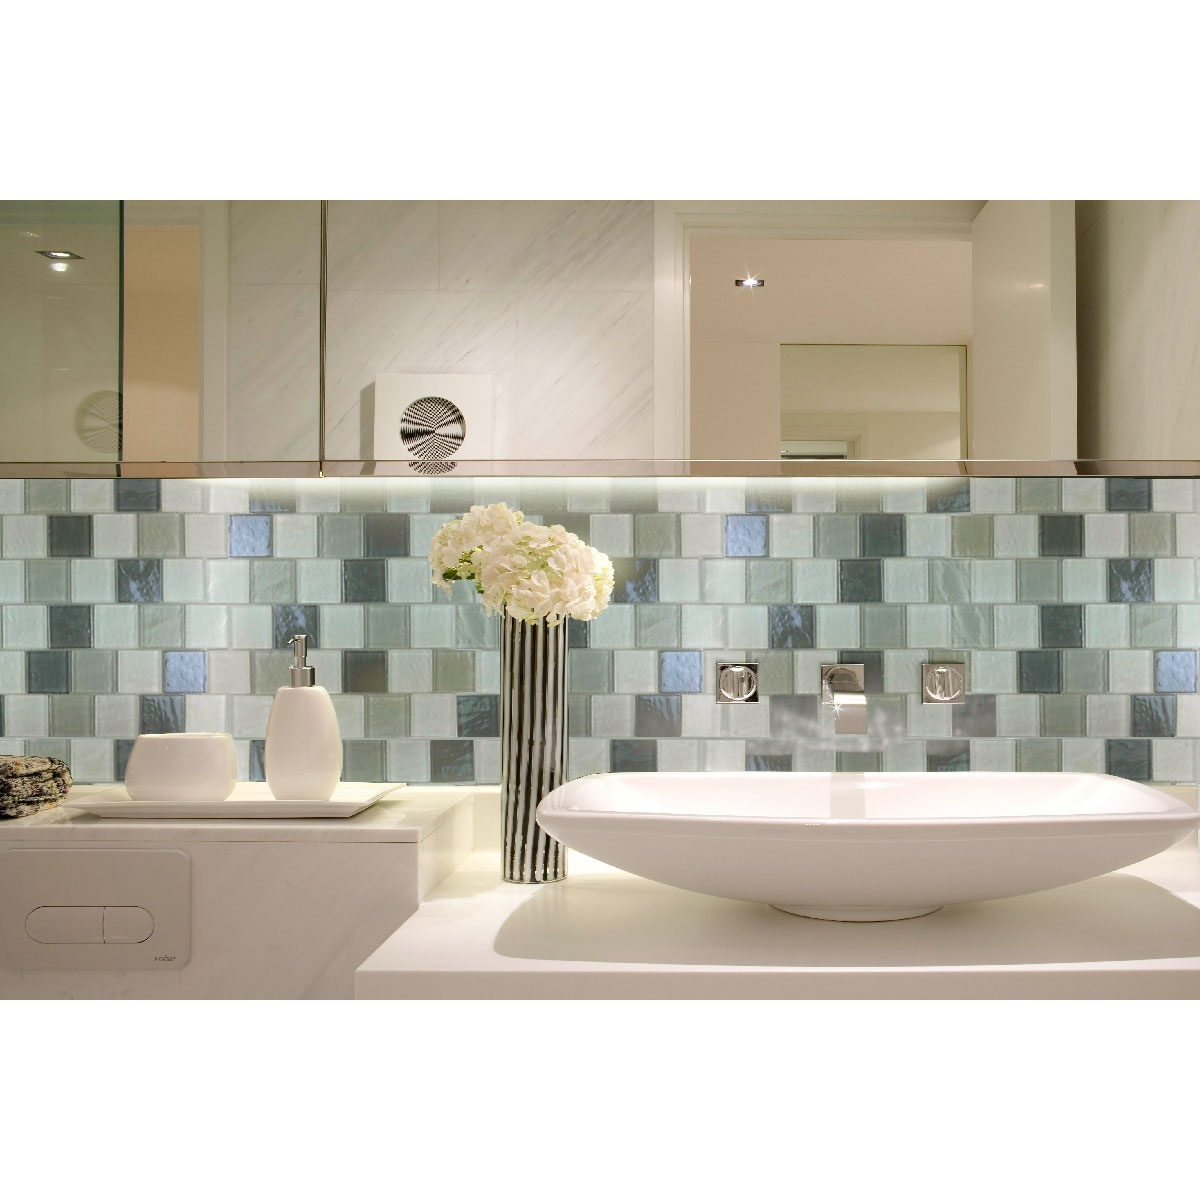 "Geo 2"" x 2"" Textured Gray Glass Brick Backsplash Mosaic Wall Tile"